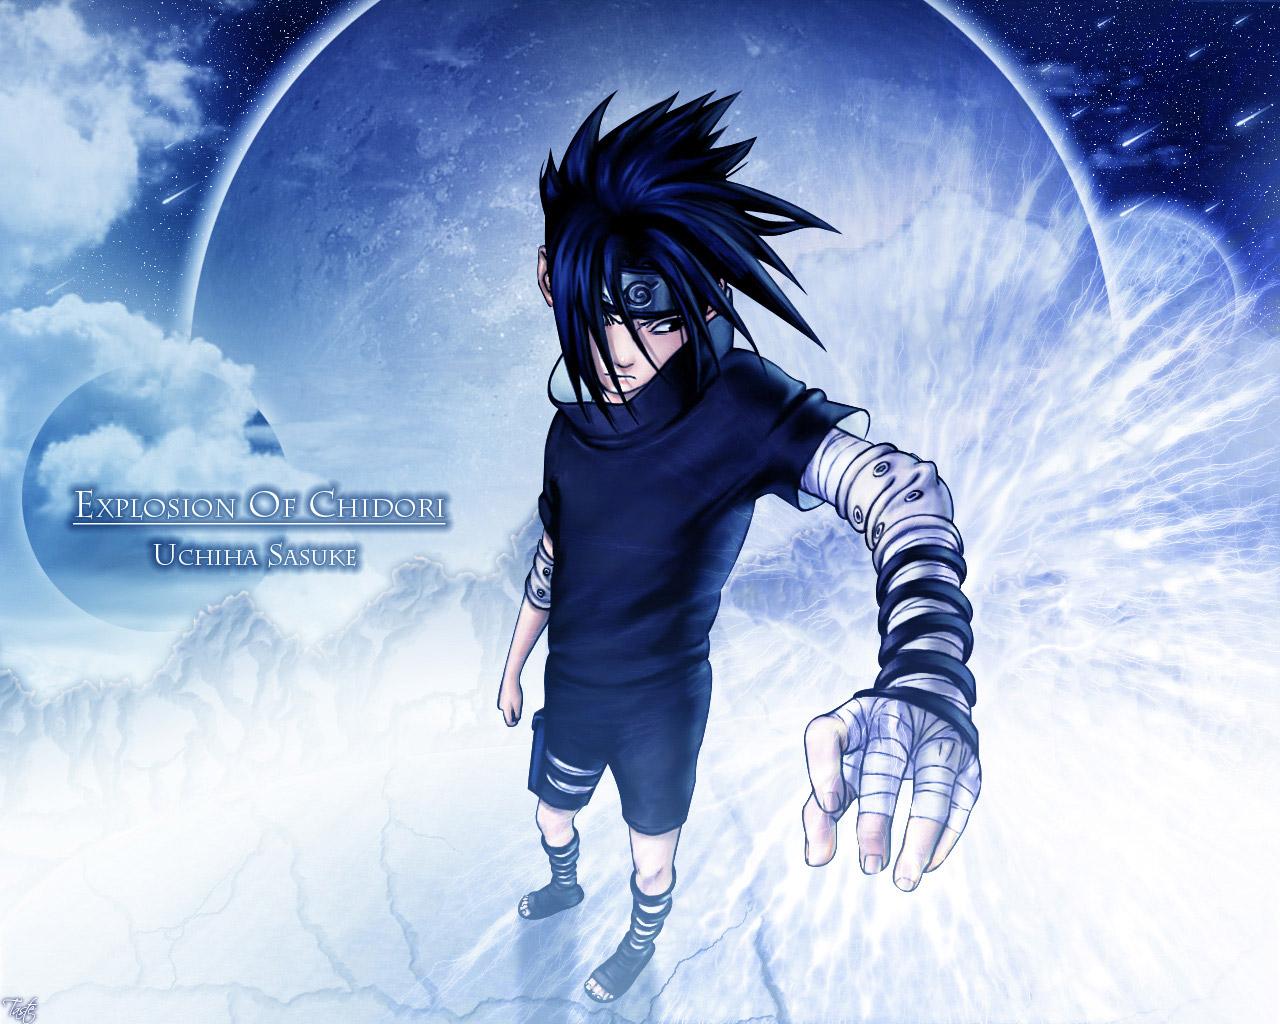 Download the Naruto anime wallpaper titled: 'Uchiha Sasuke'.